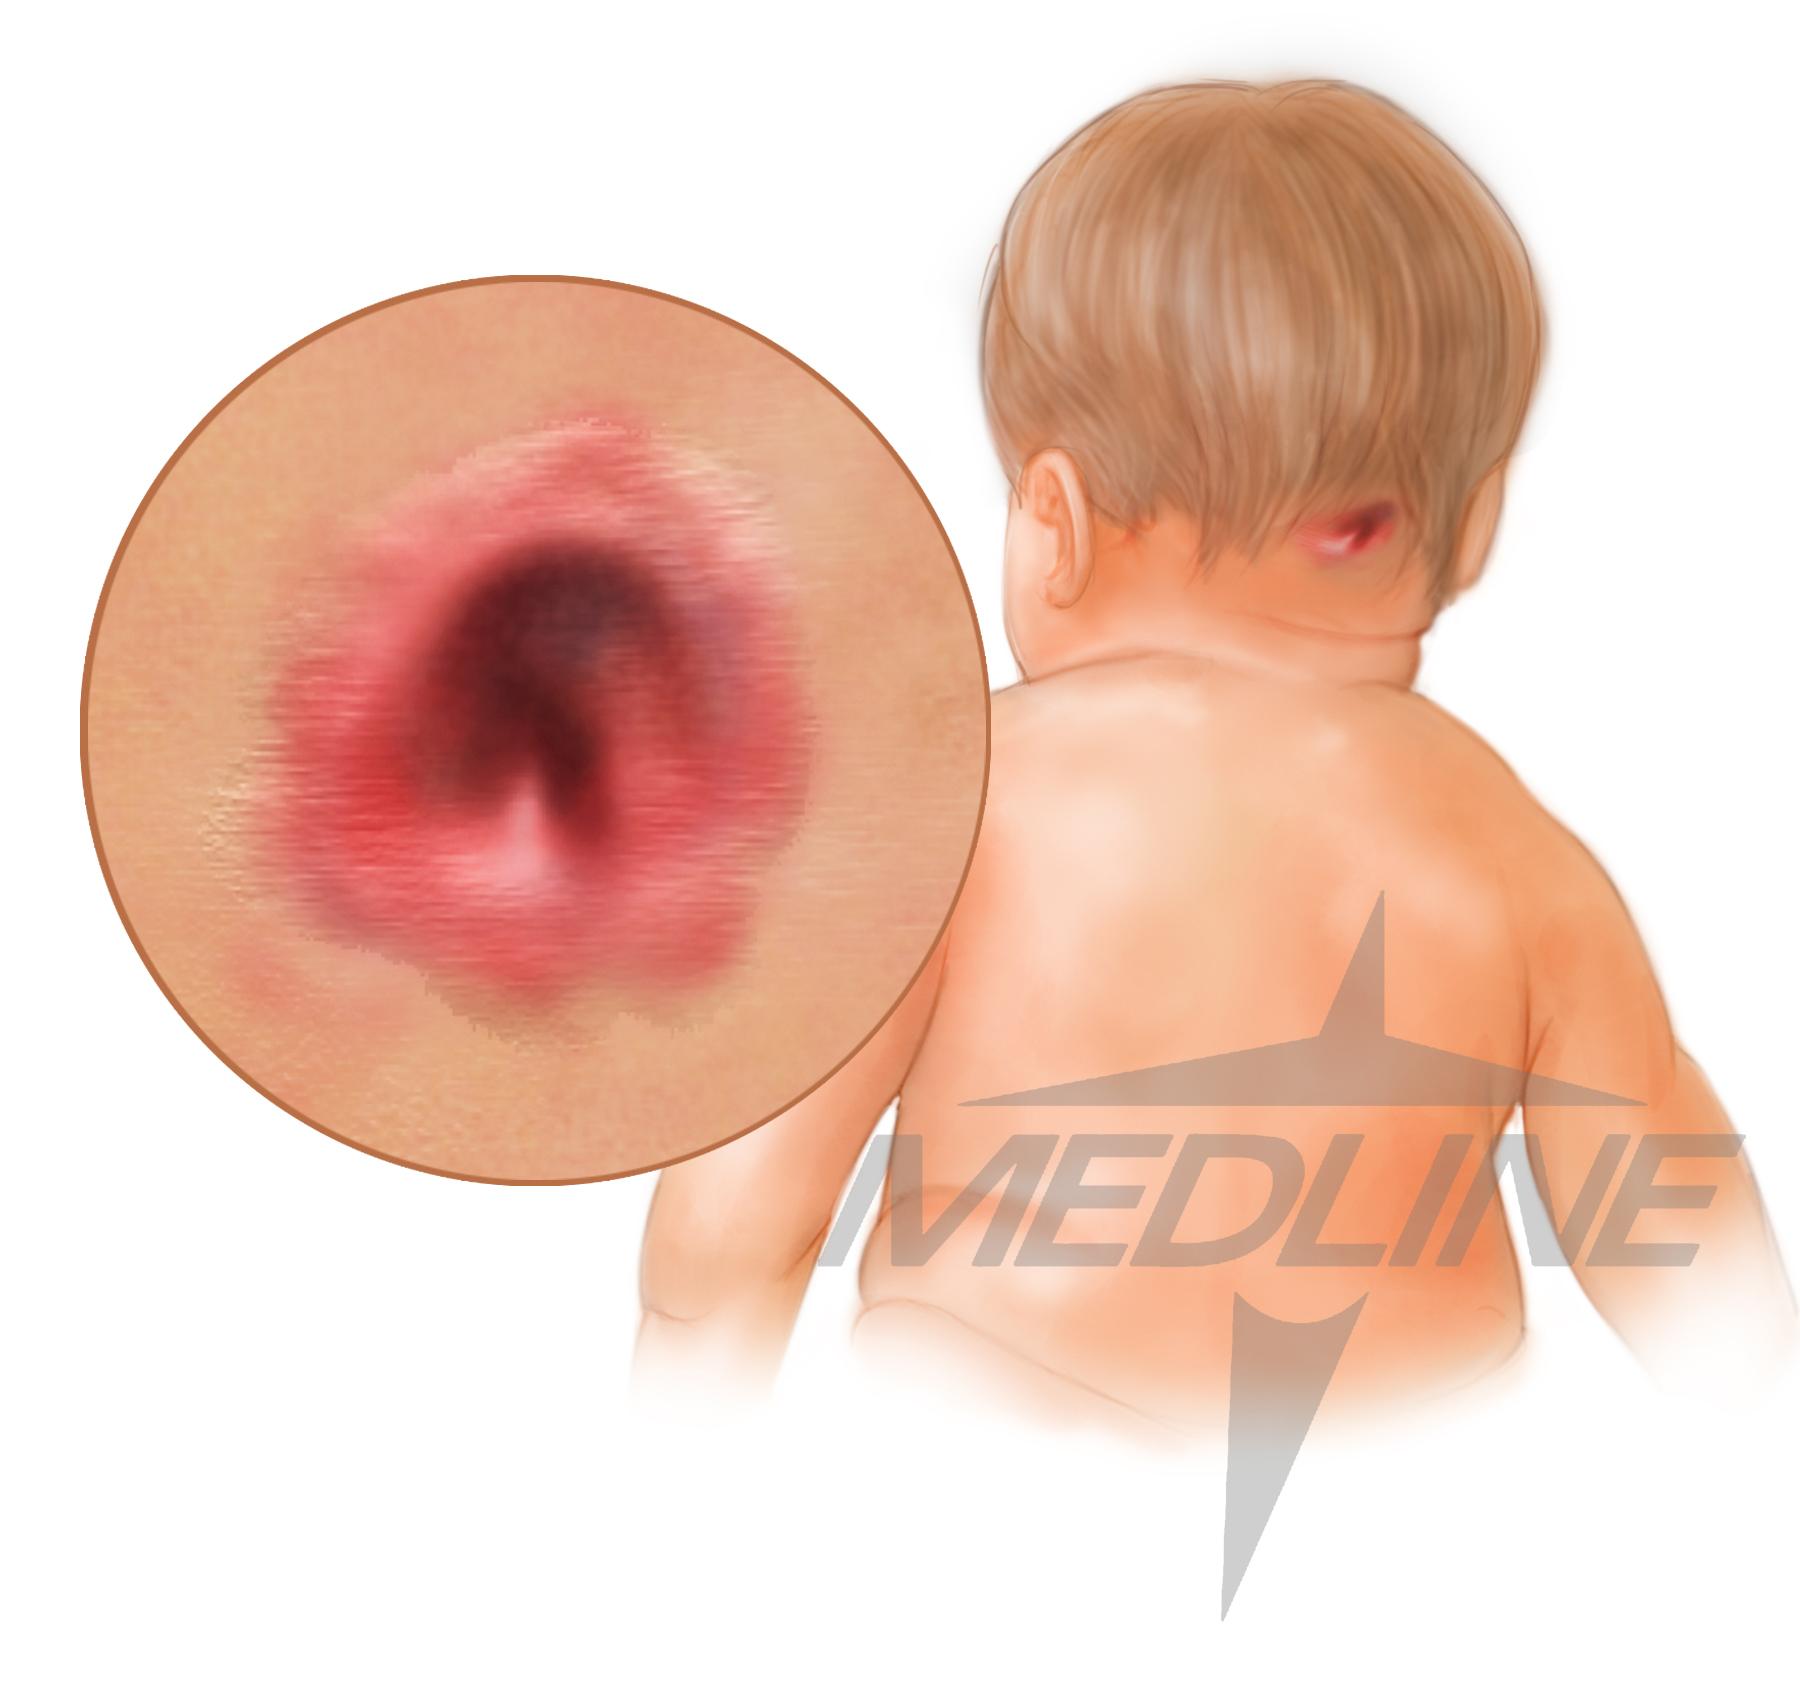 occipitalpressureinjury.jpg